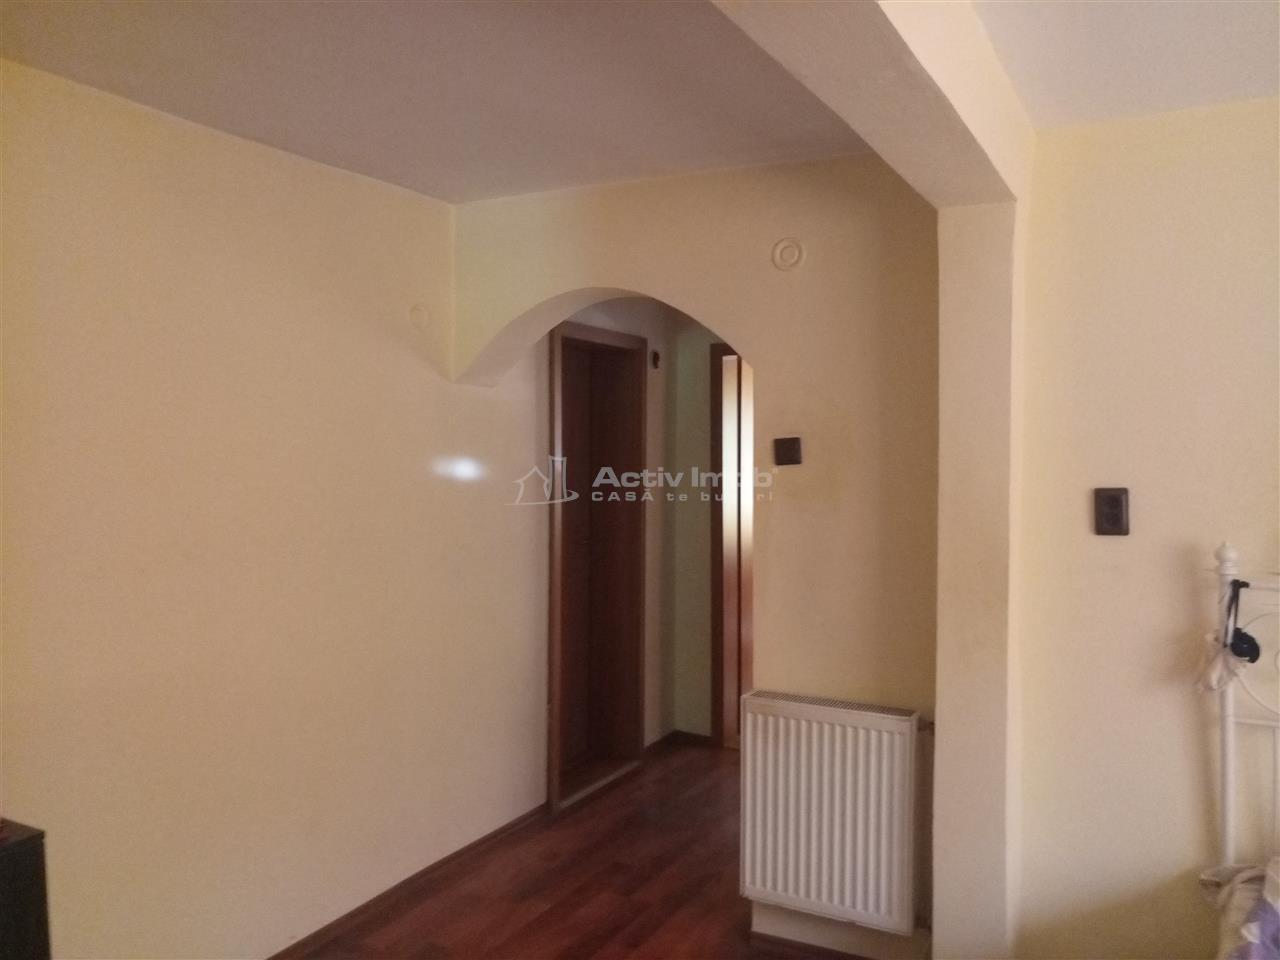 Oportunitate: 4500 mp (casa+spatiu+++) Serbanesti 5 min de centru BC